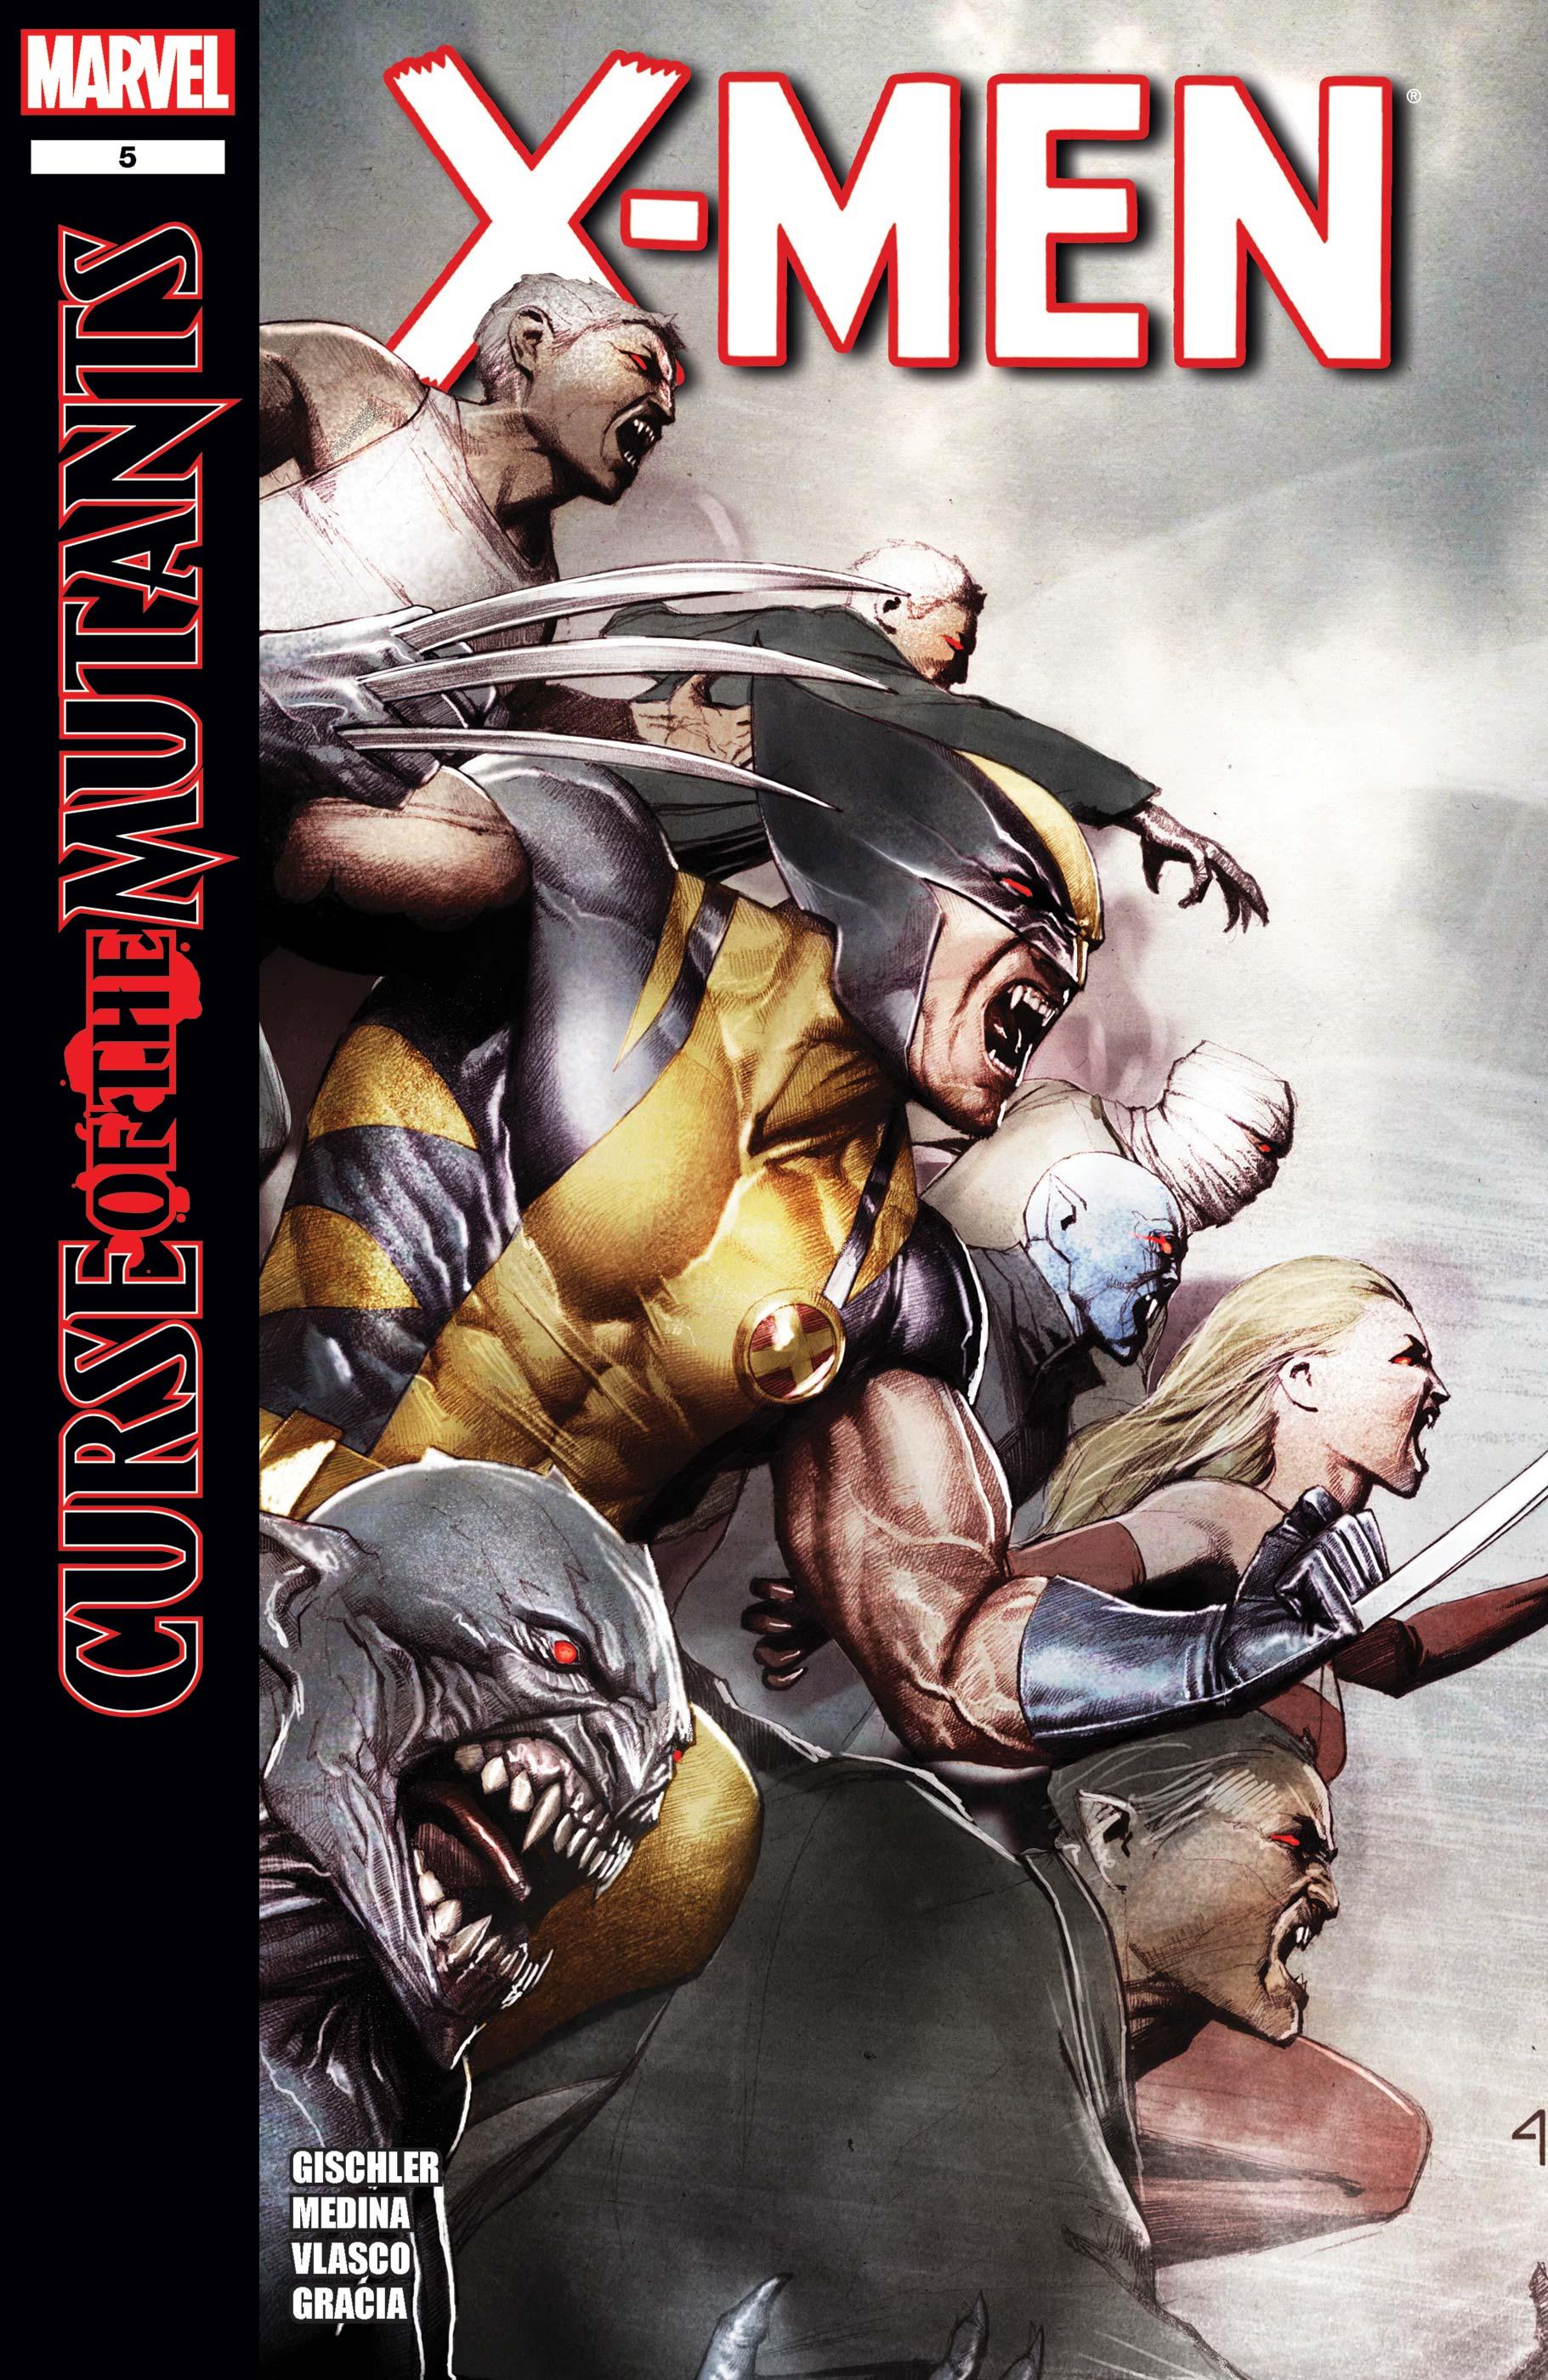 X-Men (2010) #5